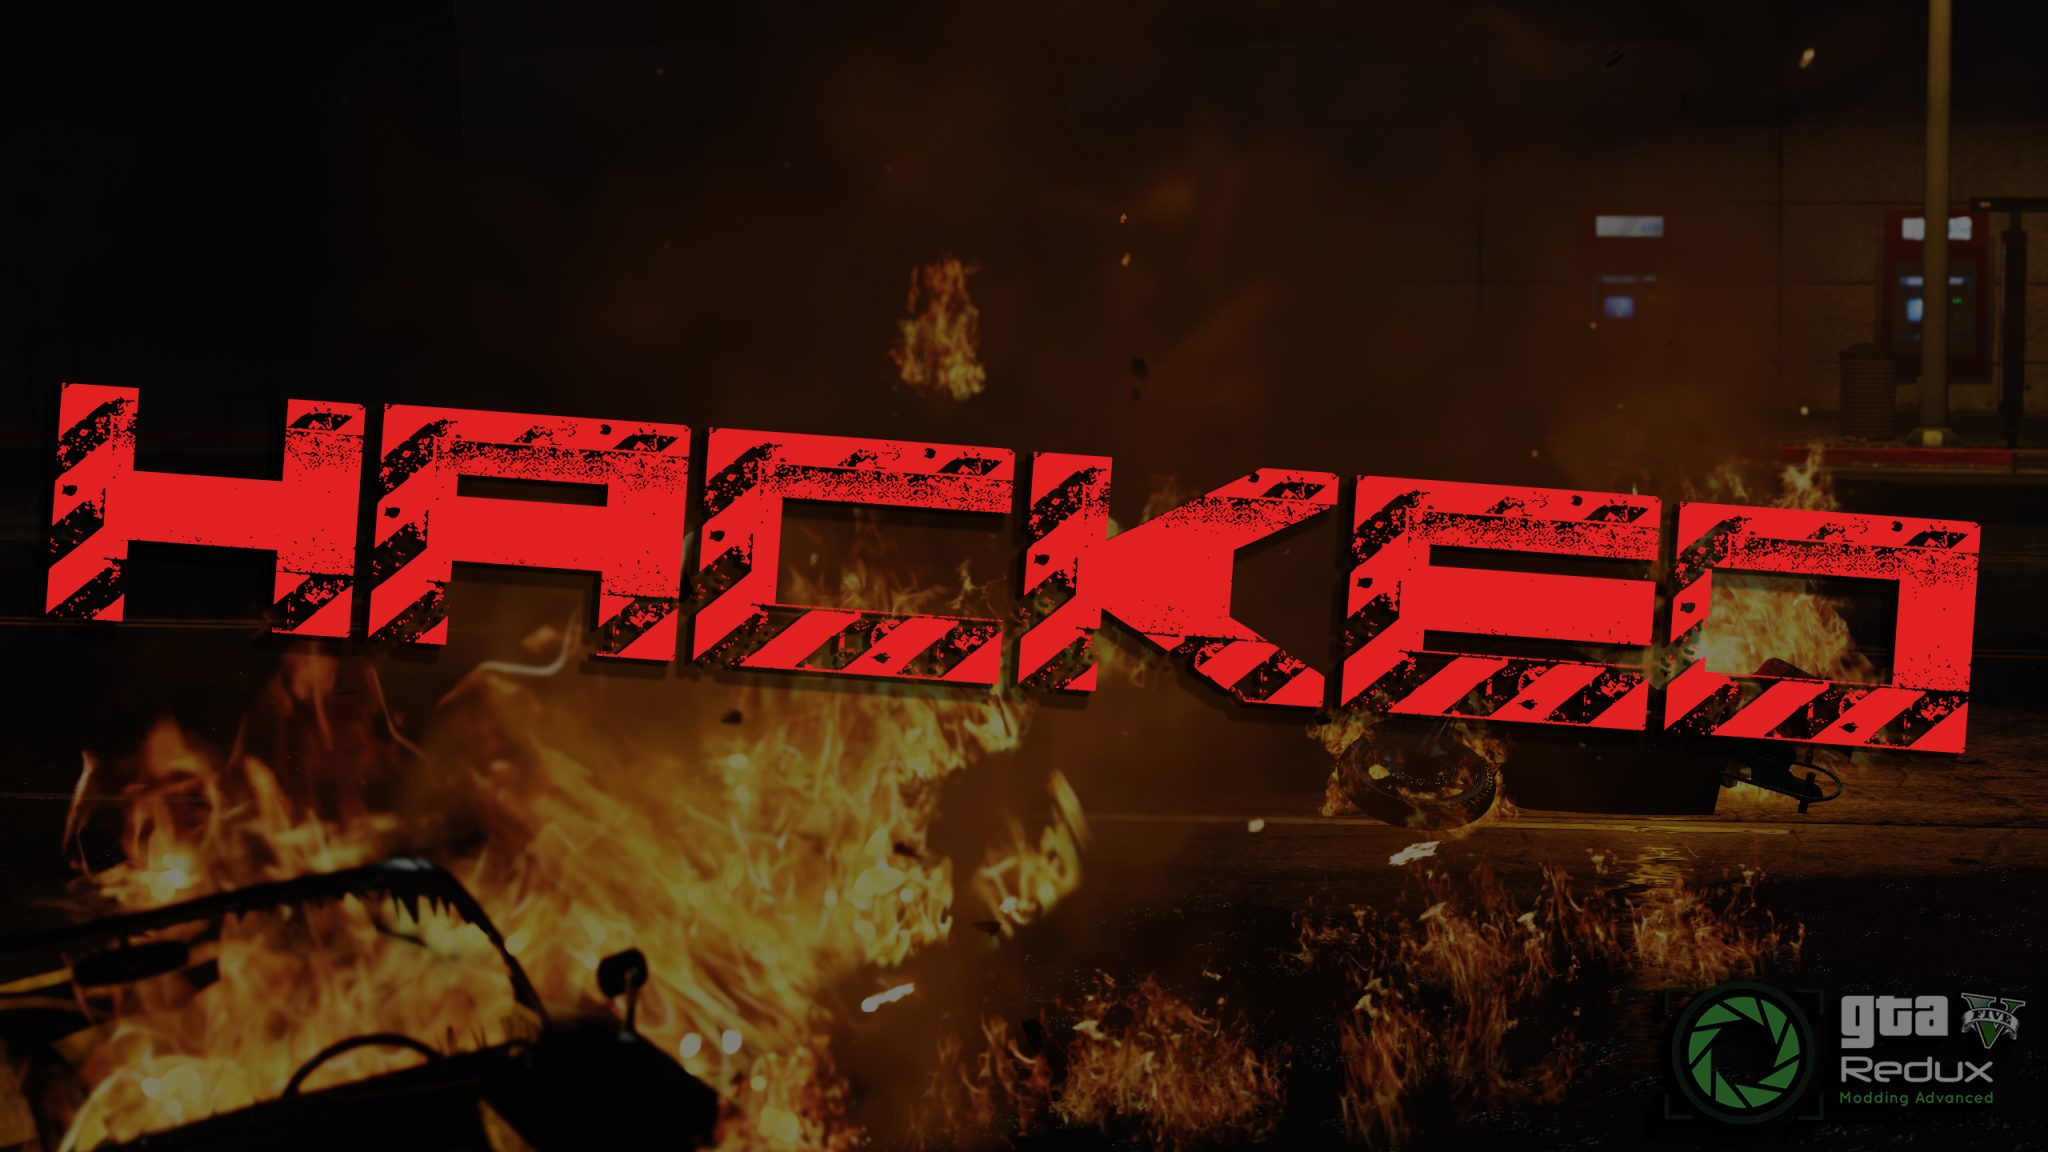 REDUX HACKED!!!!